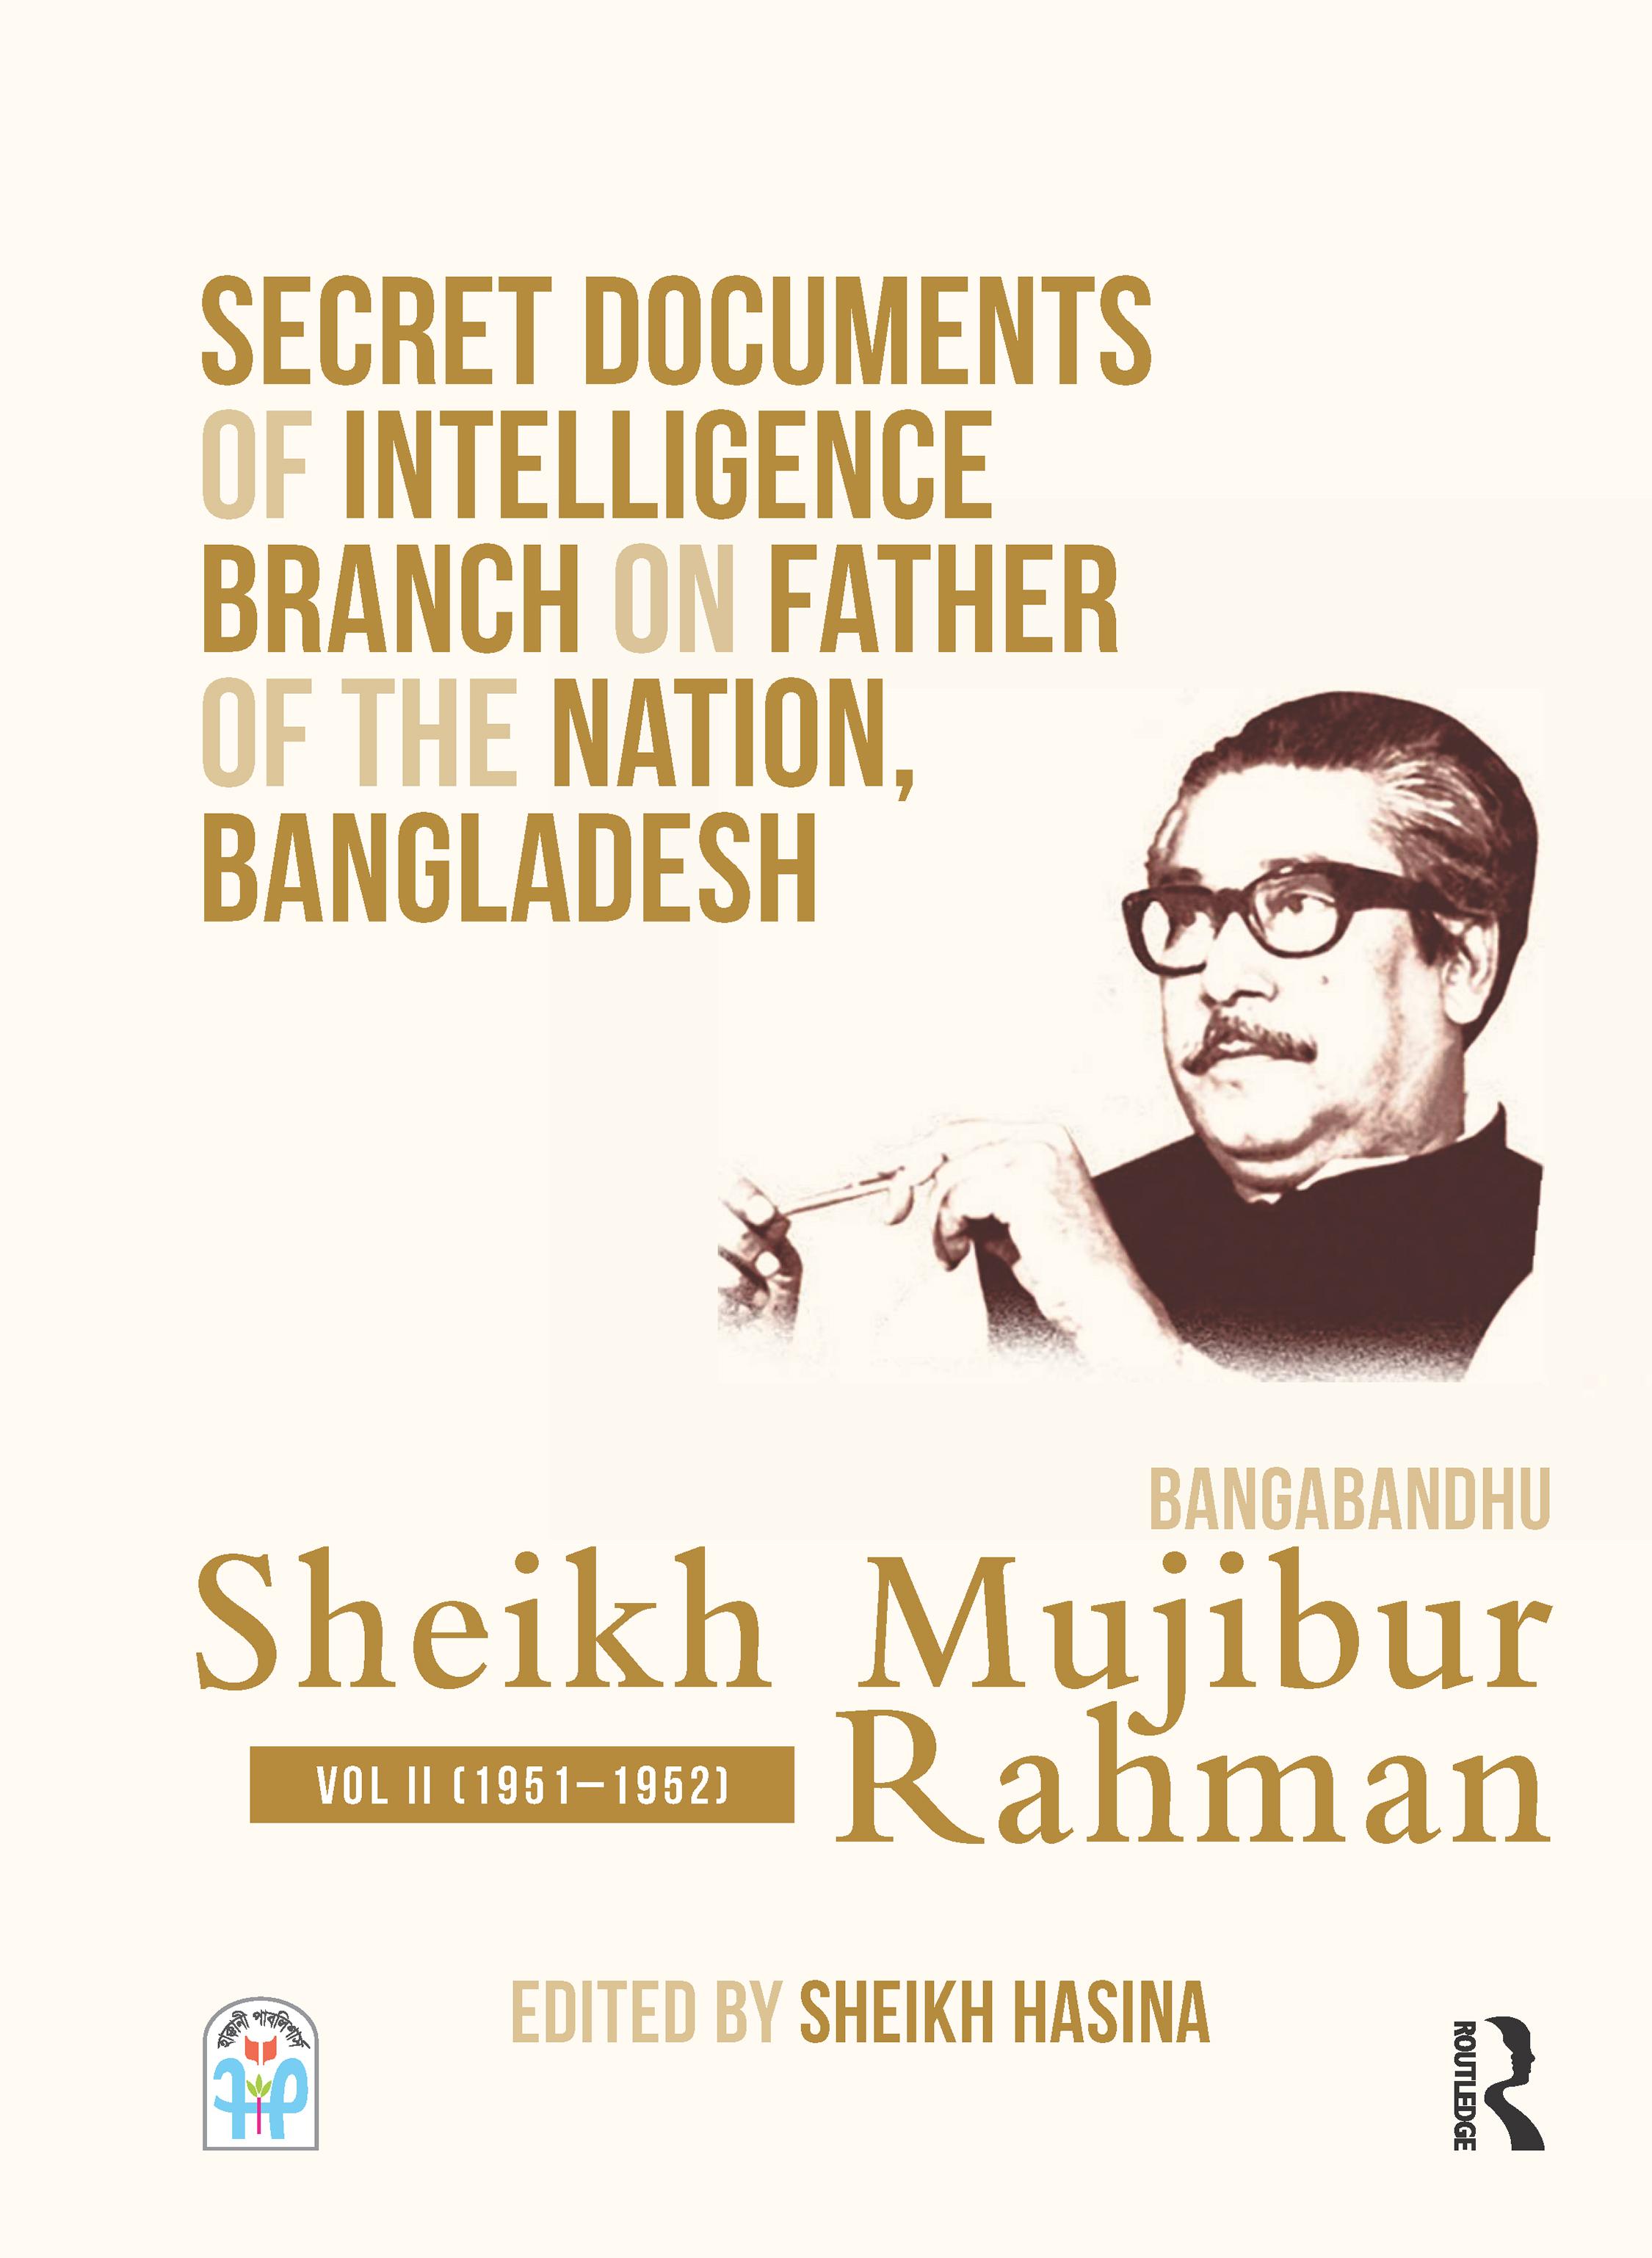 Secret Documents of Intelligence Branch on Father of the Nation, Bangladesh Bangabandhu Sheikh Mujibur Rahman 1948–1971 Declassified Documents Vol - II (1951–1952)